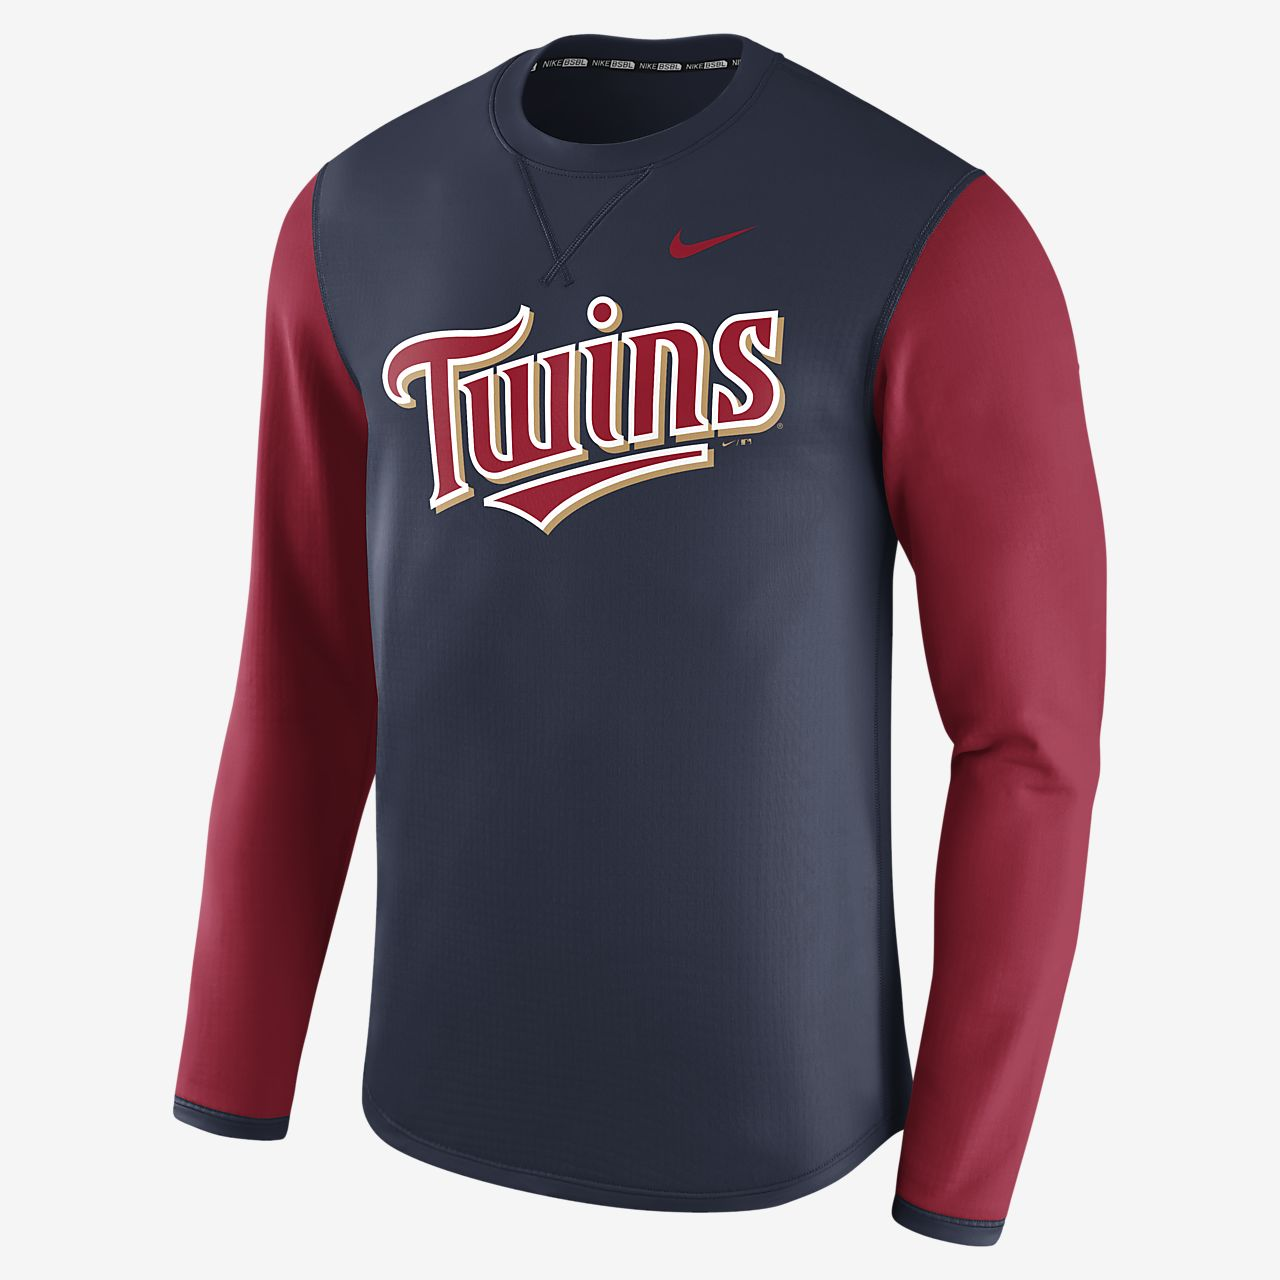 Nike Thermal Crew (MLB Twins) Men's Long Sleeve Shirt. Nike.com